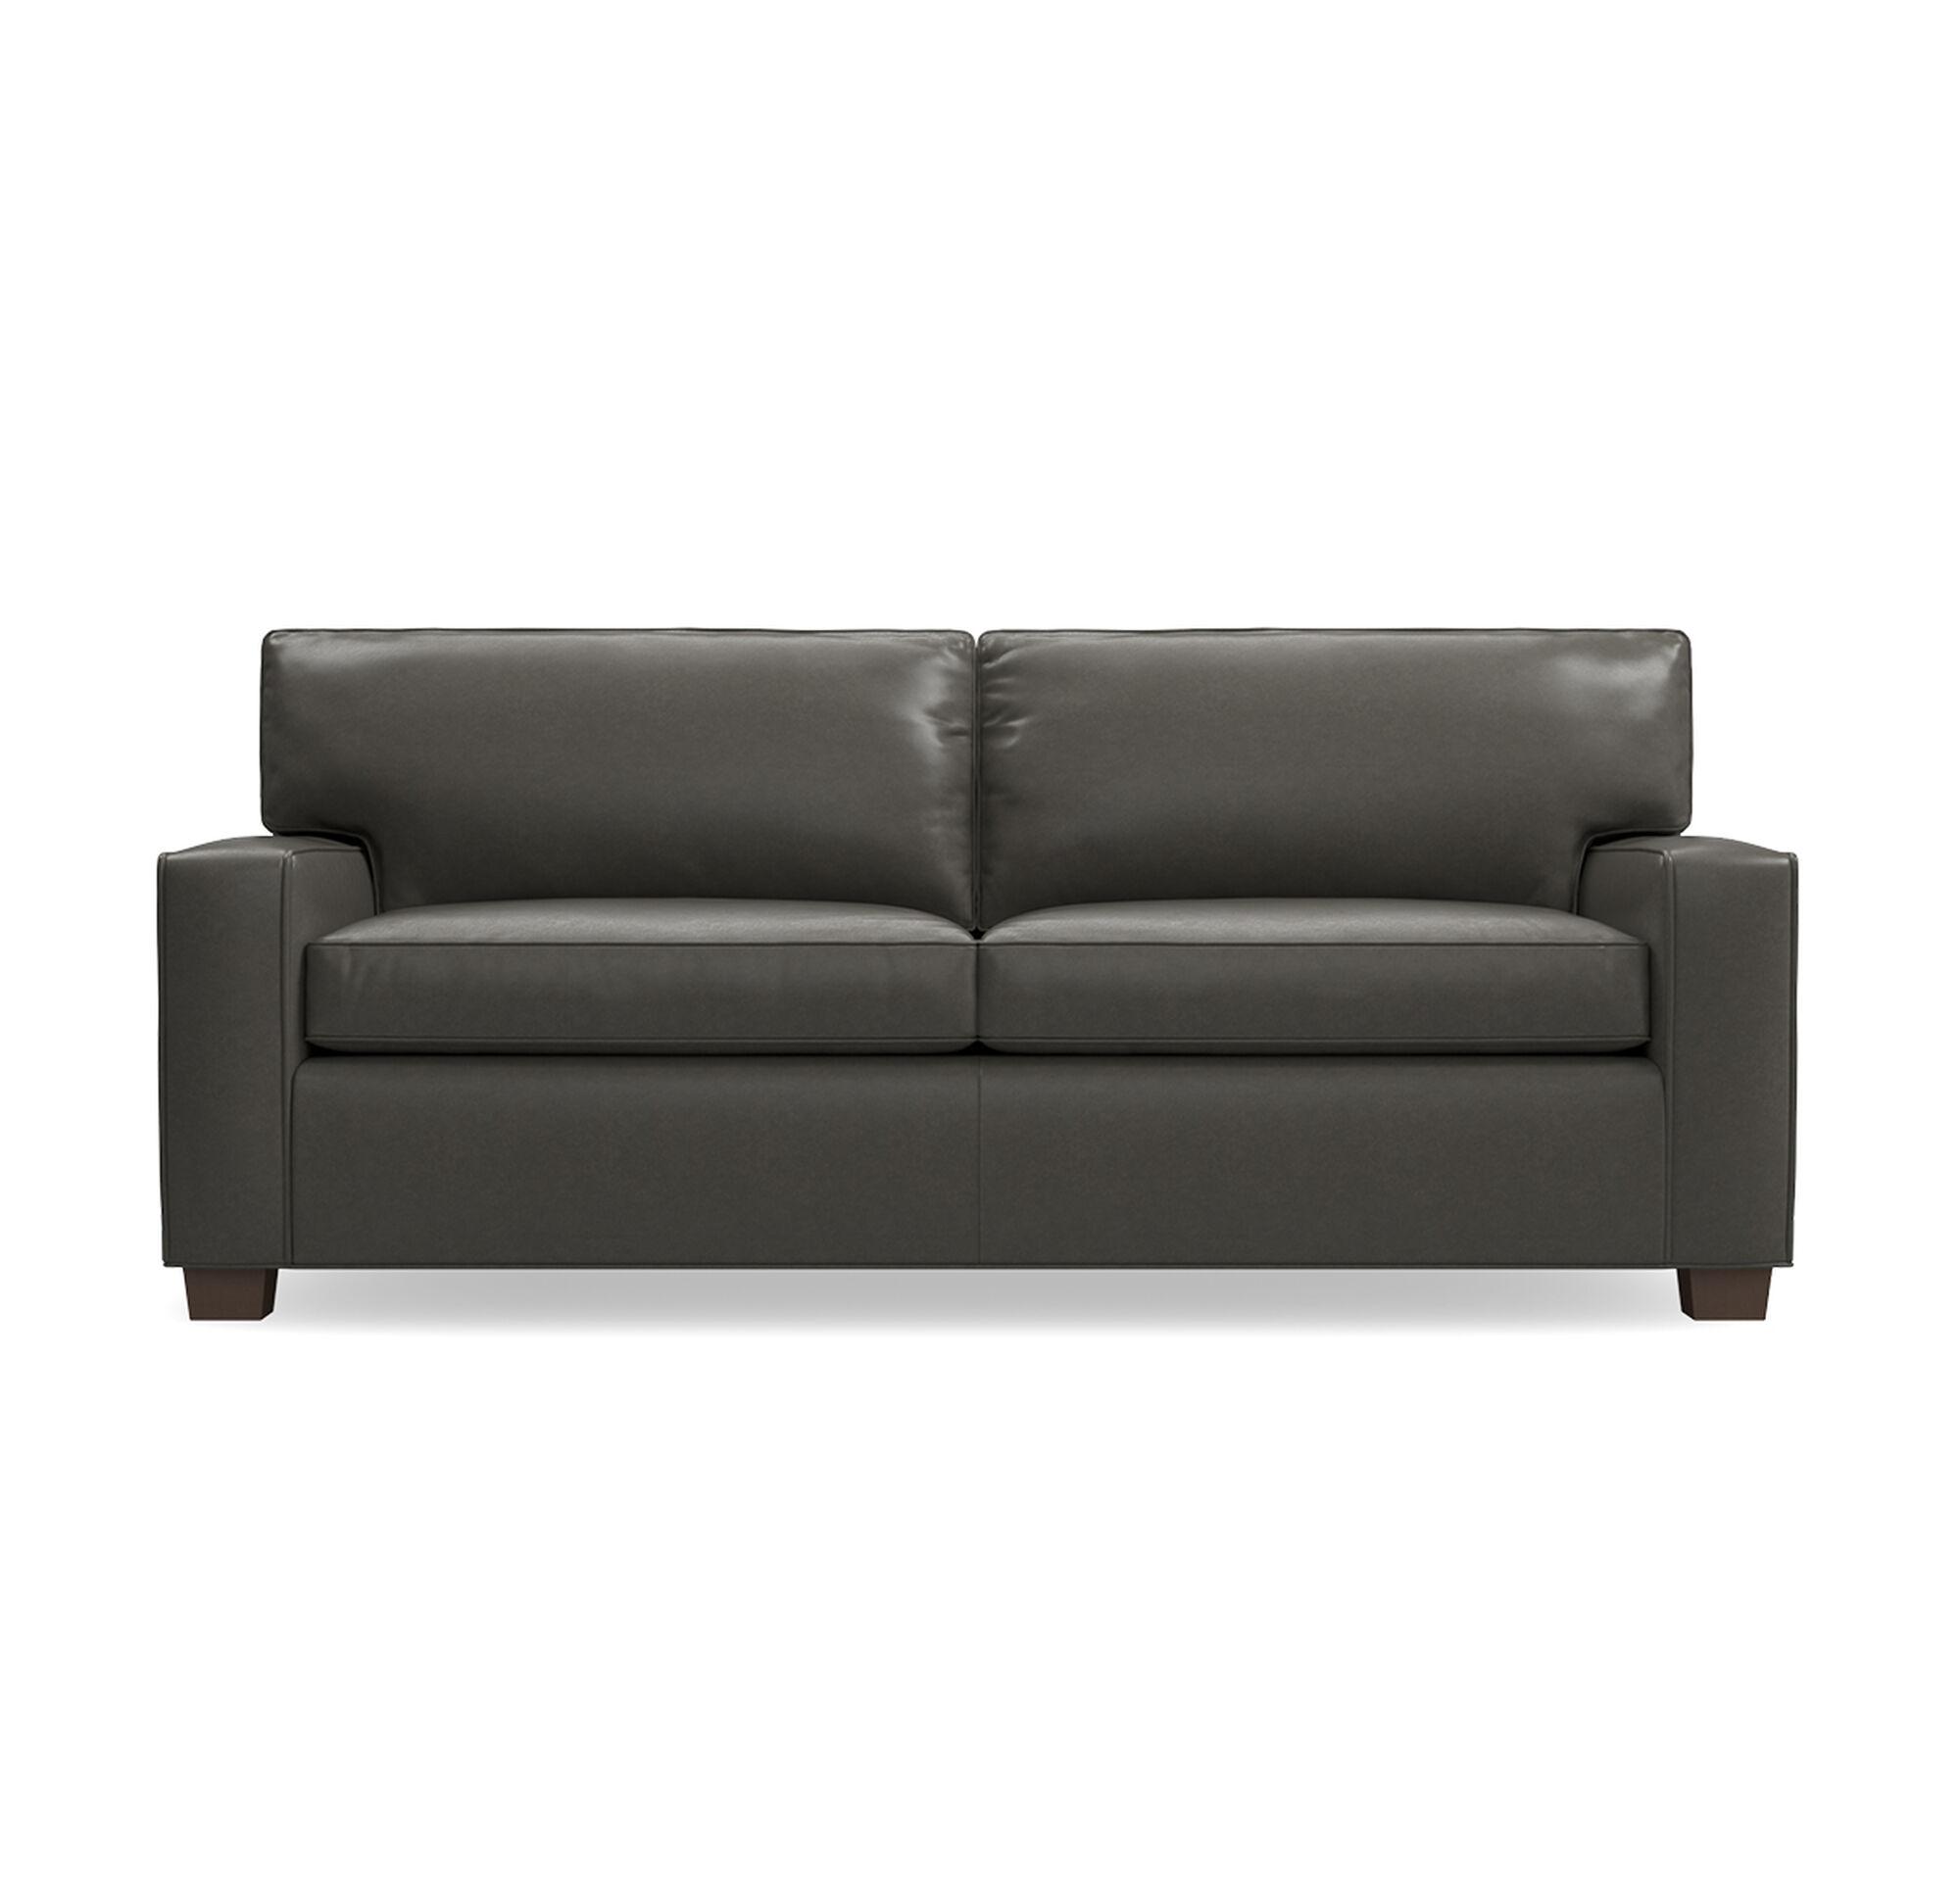 alex leather luxe queen sleeper sofa